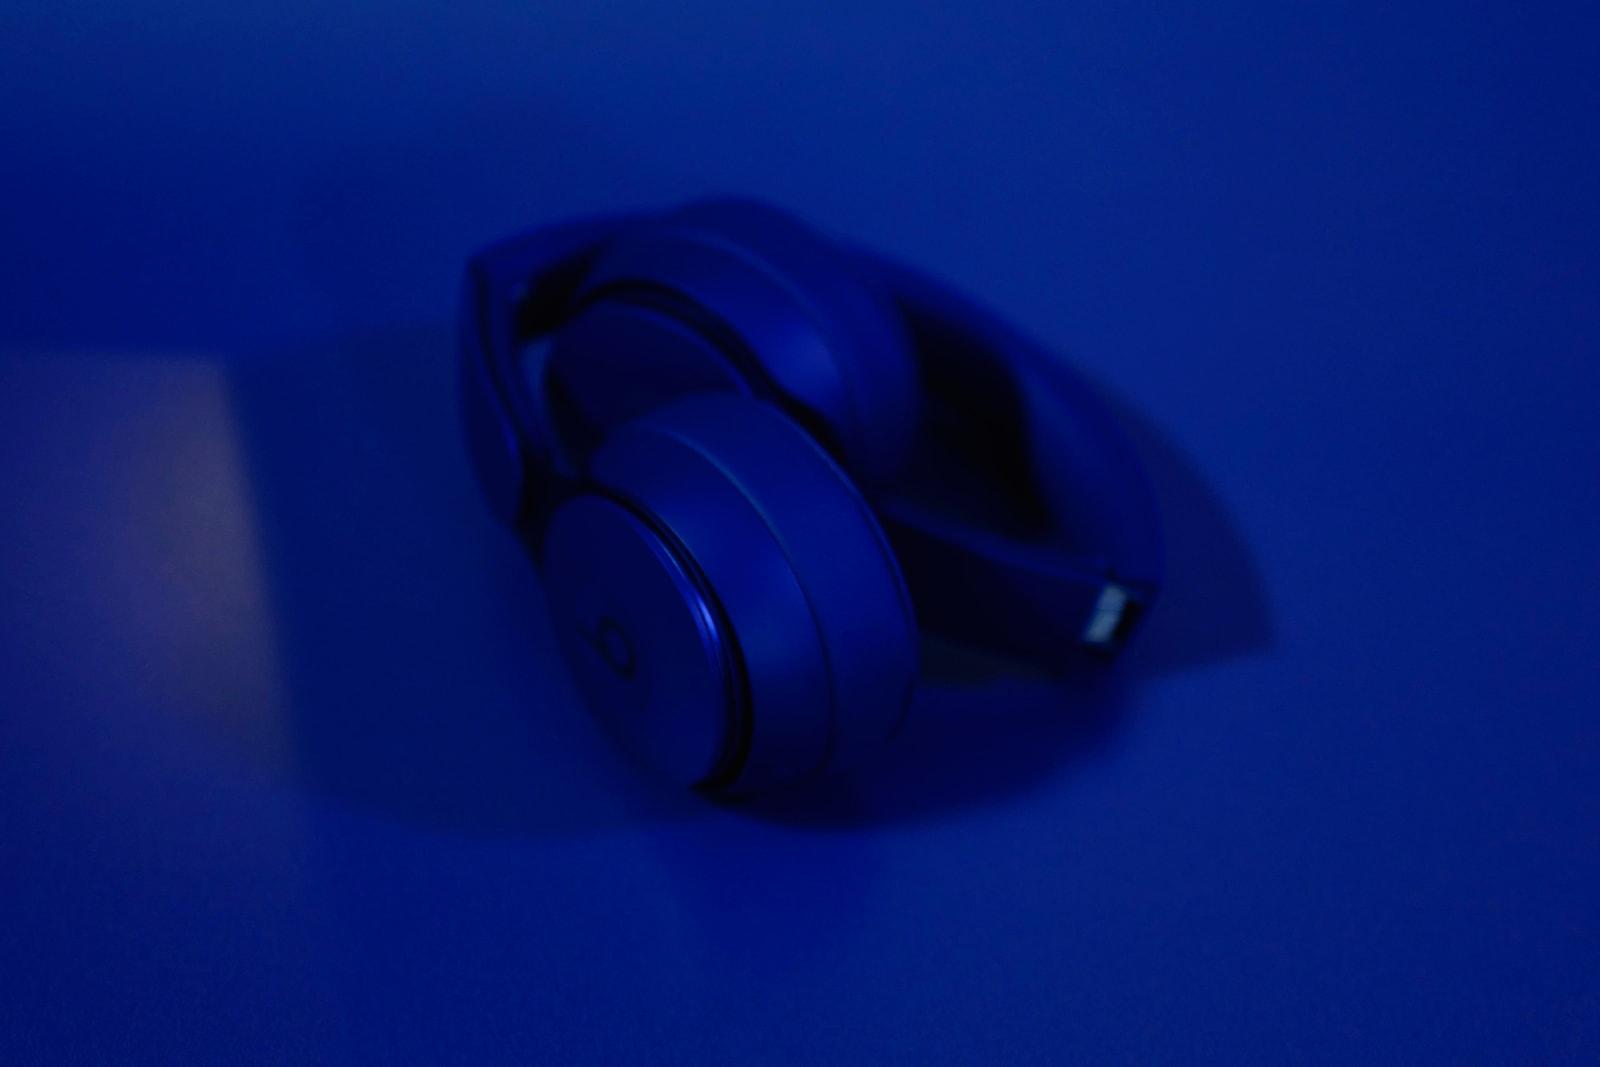 HYPEBEAST 搶先近賞 Beats by Dr. Dre 無線降噪耳機 SOLO PRO